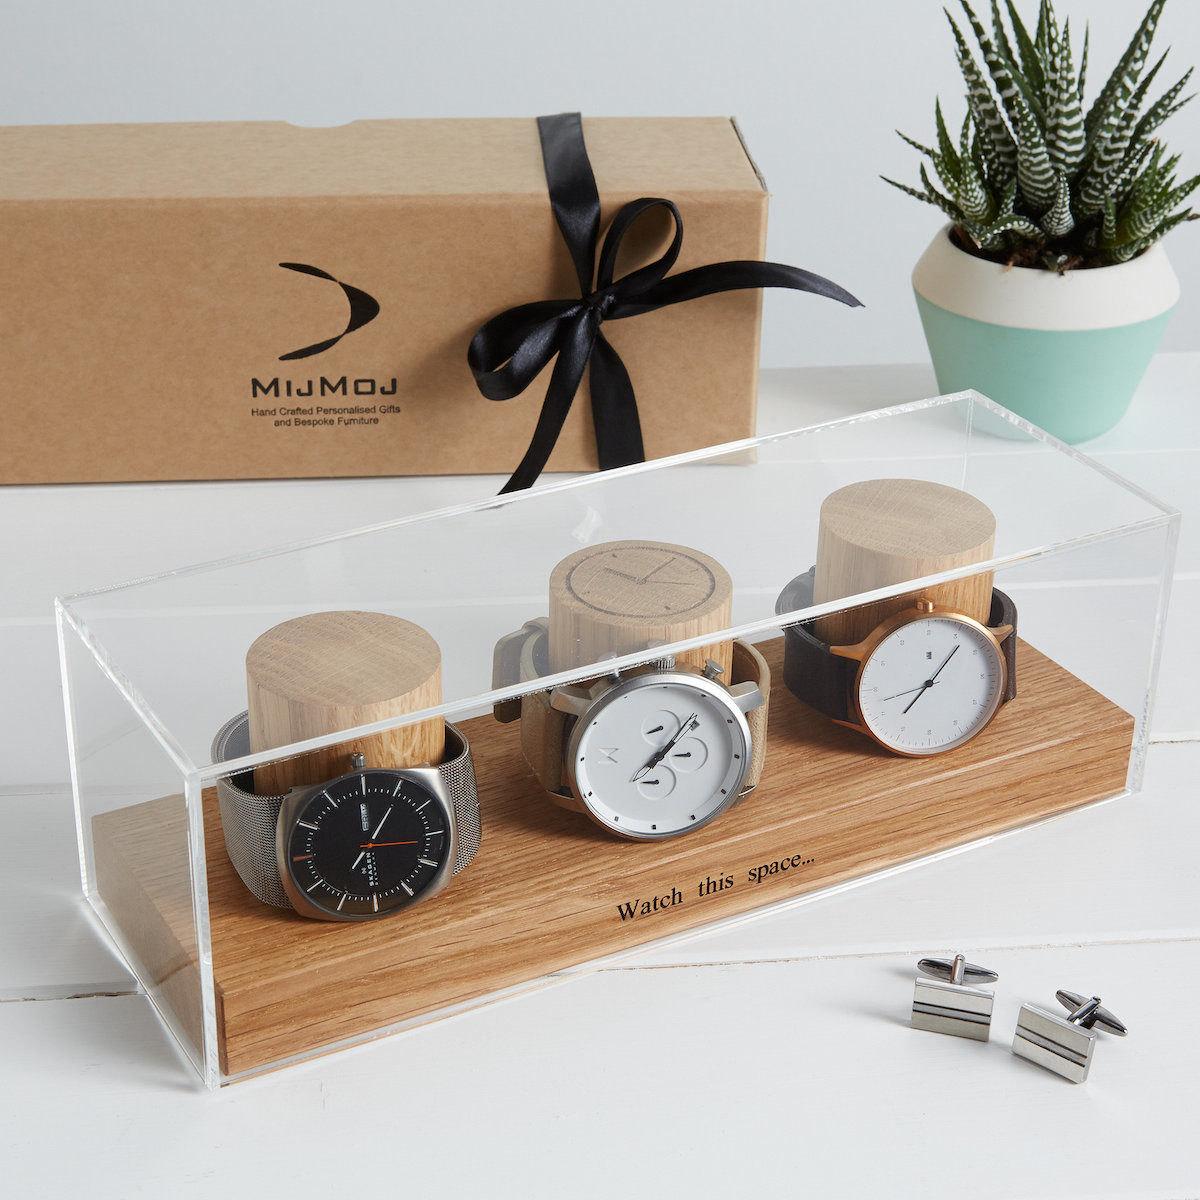 Personalized watch box with acrylic cover from MijMoj